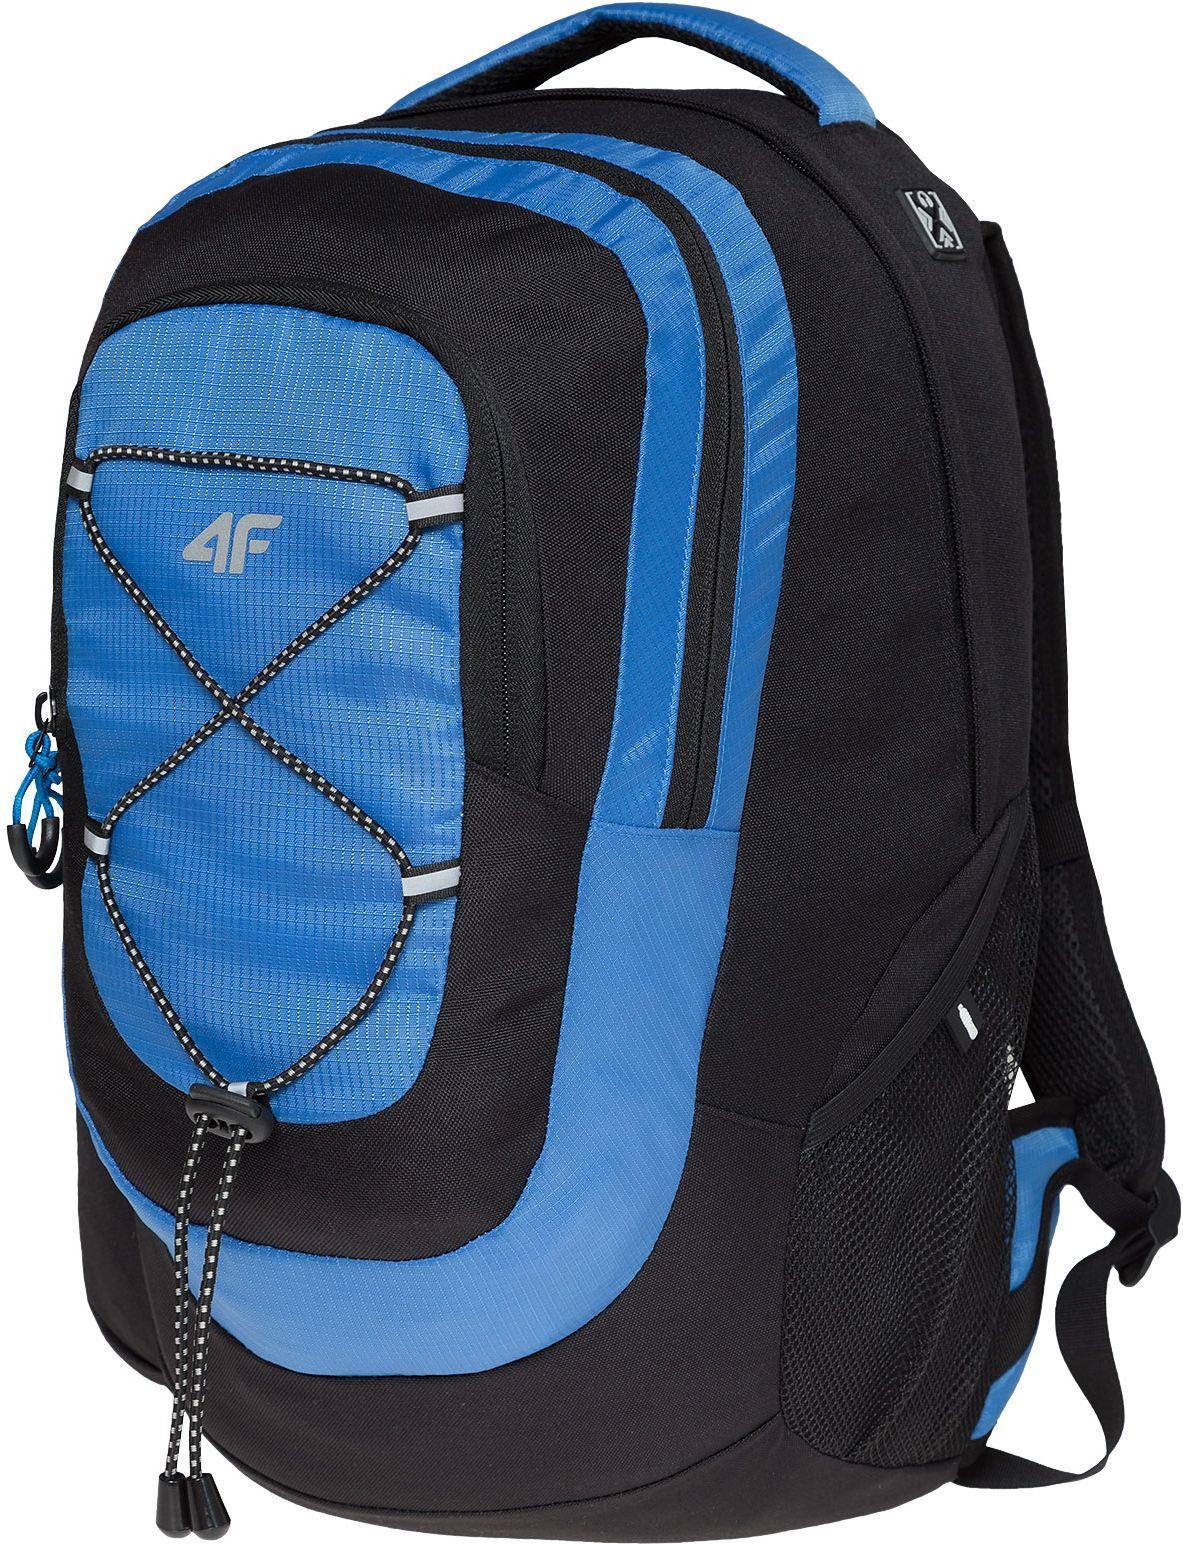 4f Plecak H4L18-PCU015 niebieski